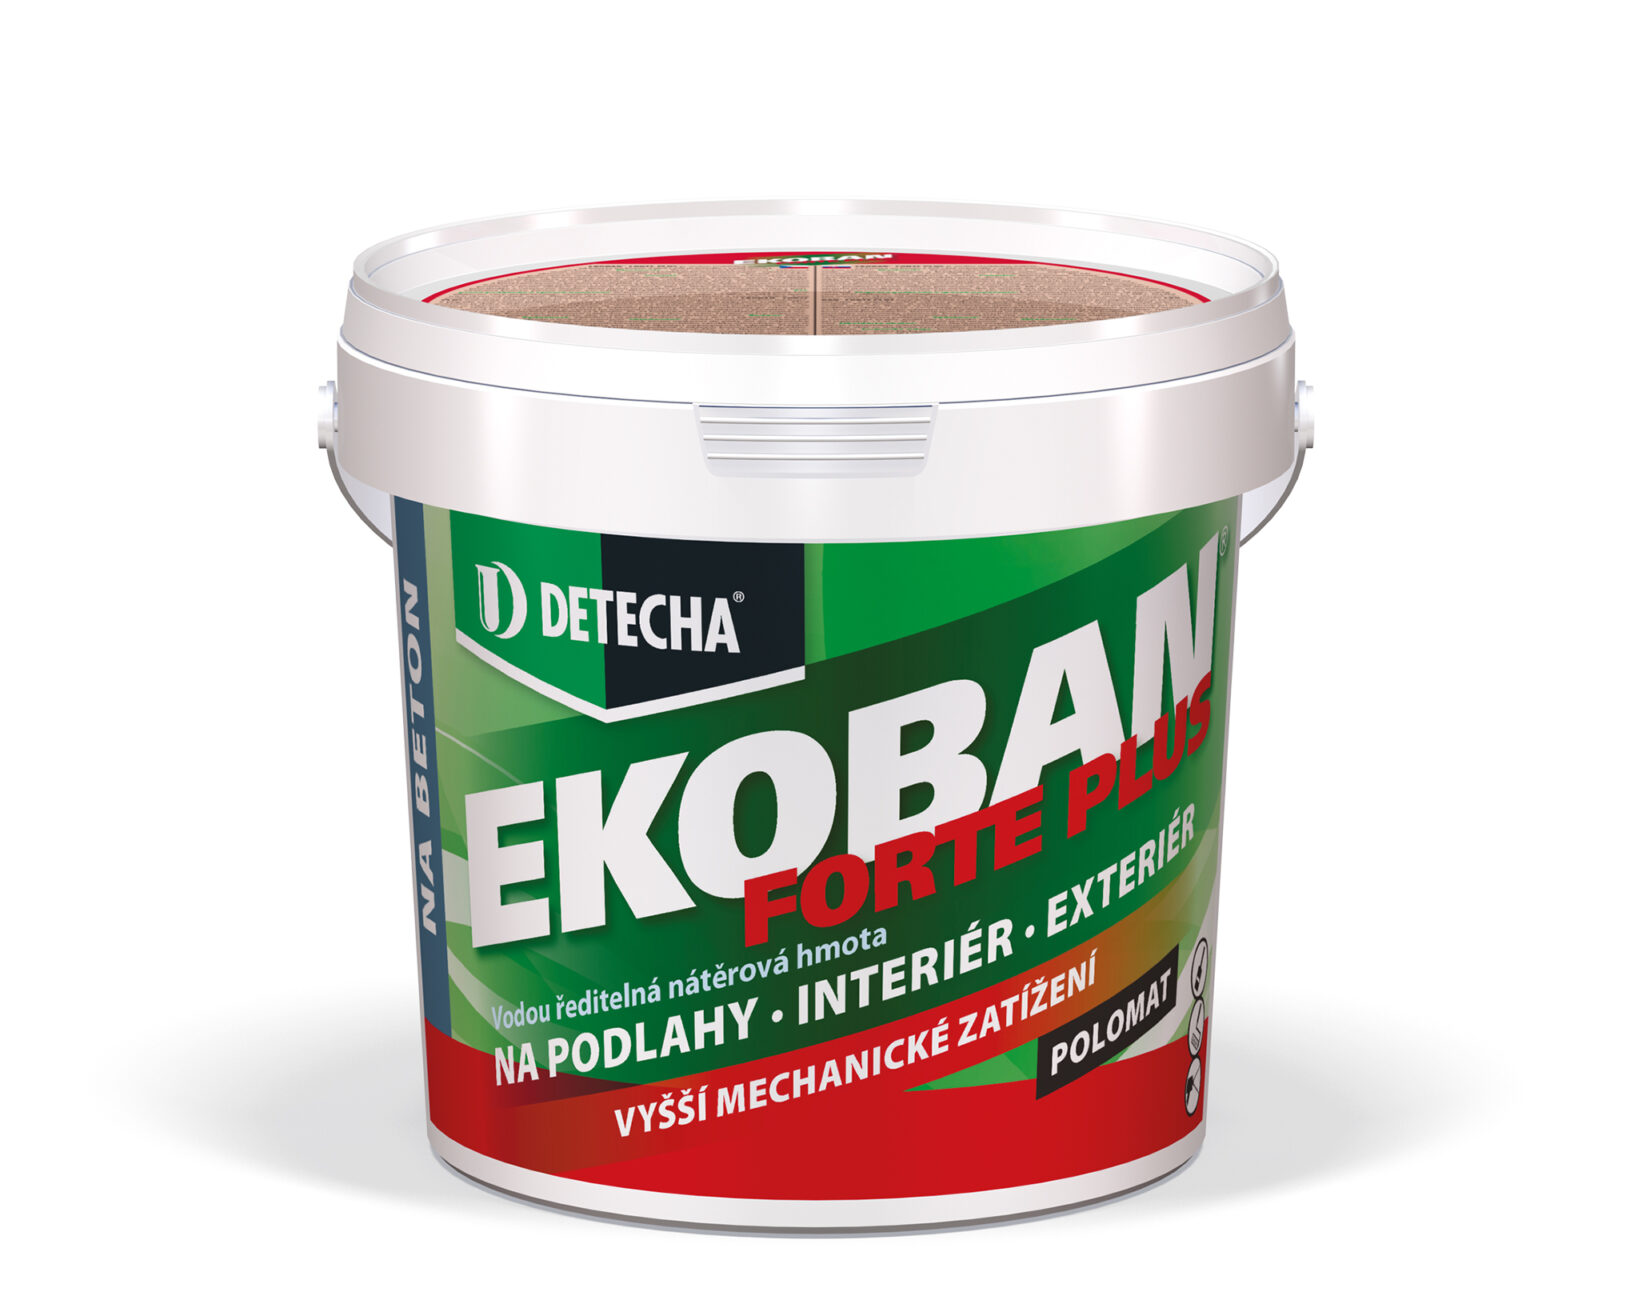 Detecha Ekoban forte plus 5 kg